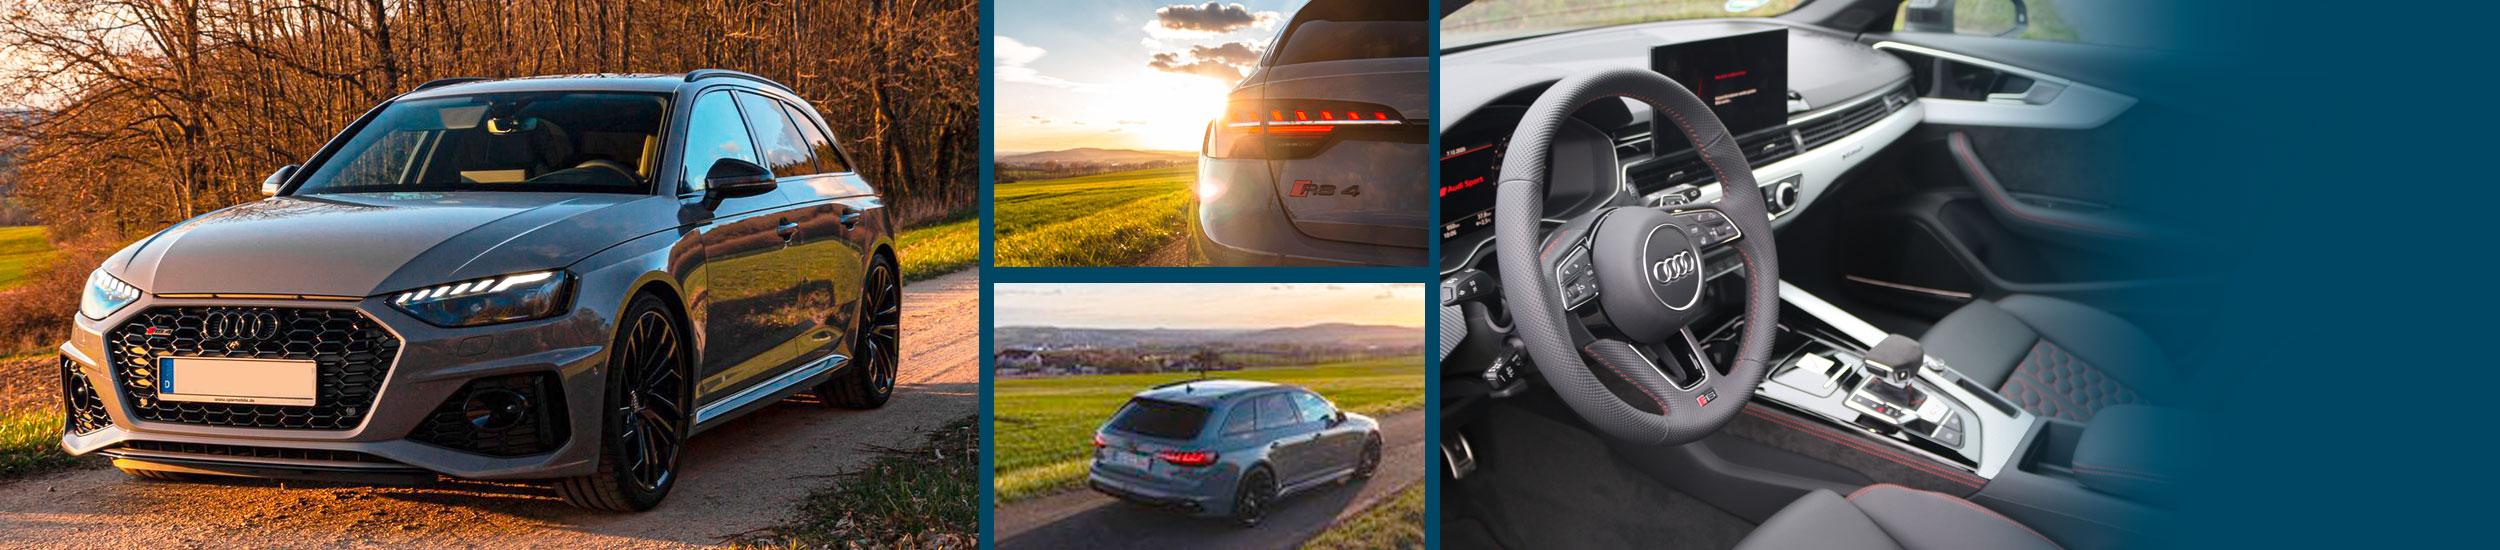 Sparmobile-AUDI-RS4-AVANT_Neu-2021-Neu